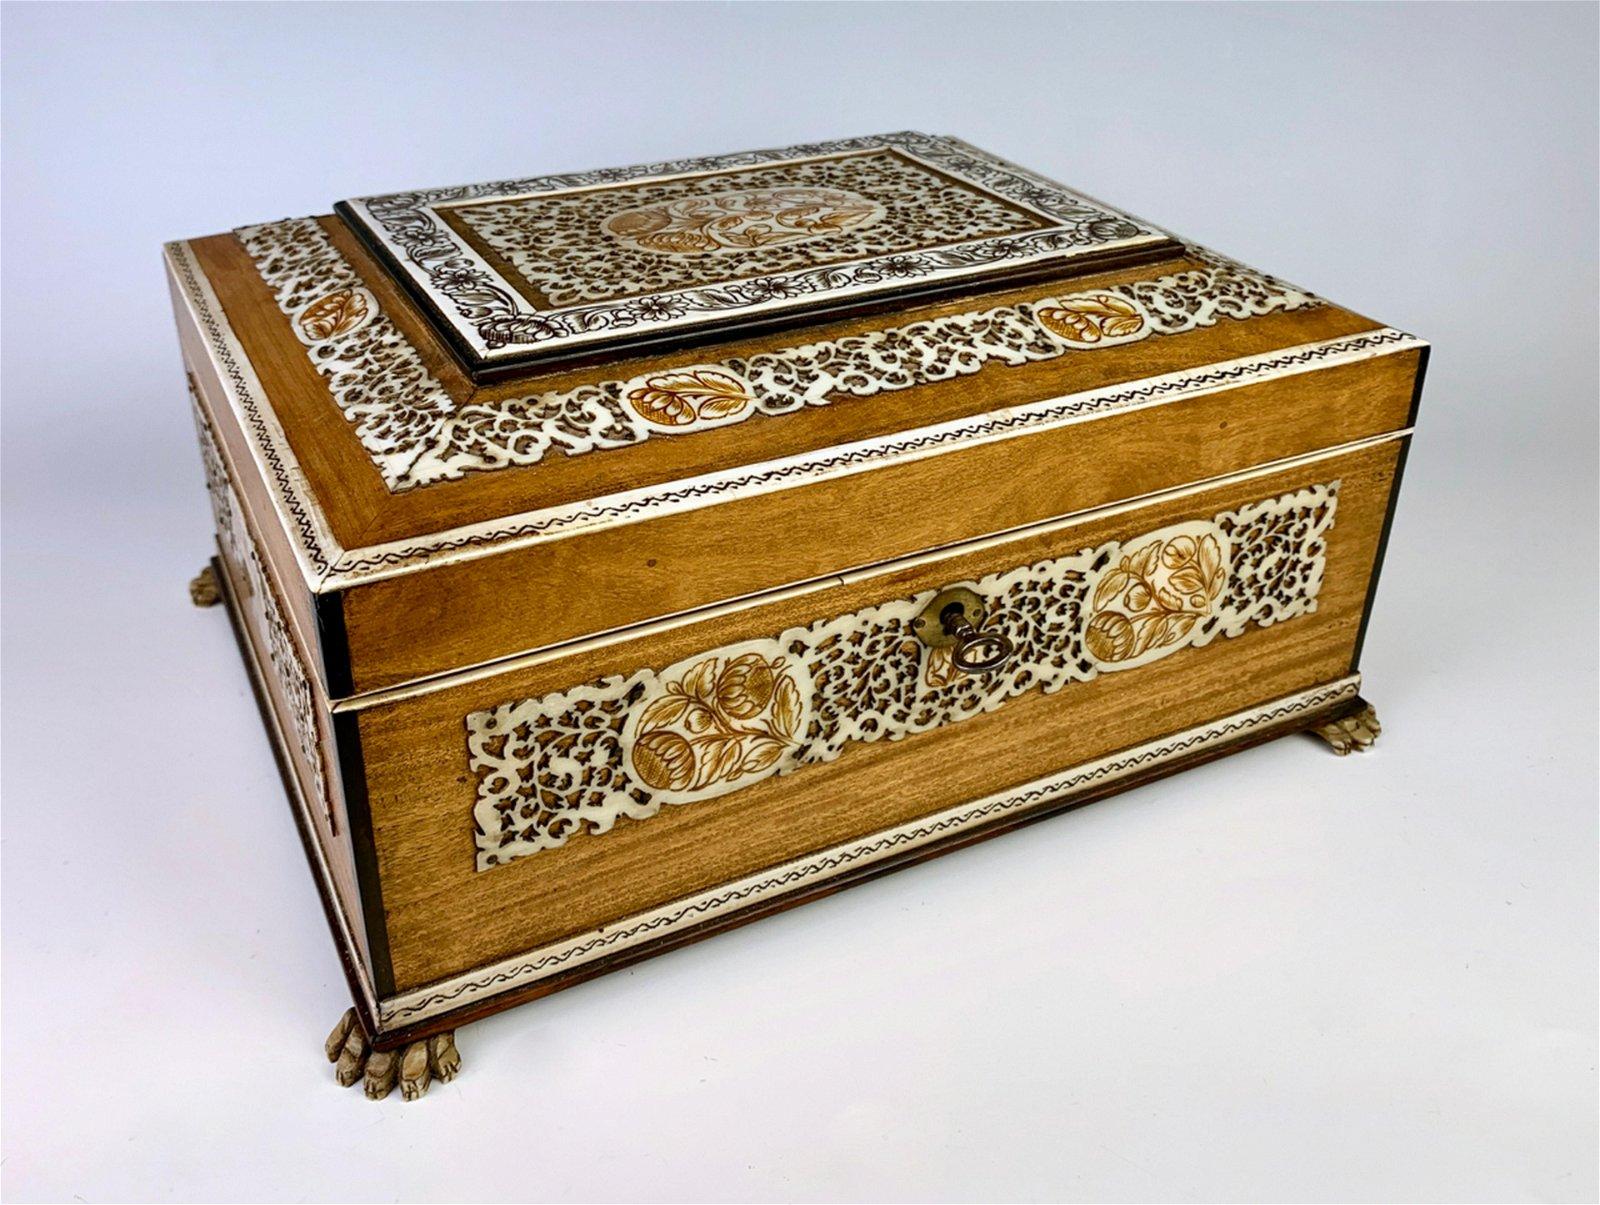 Anglo-Indian Large Jewelry Box w/ Bone Inlay